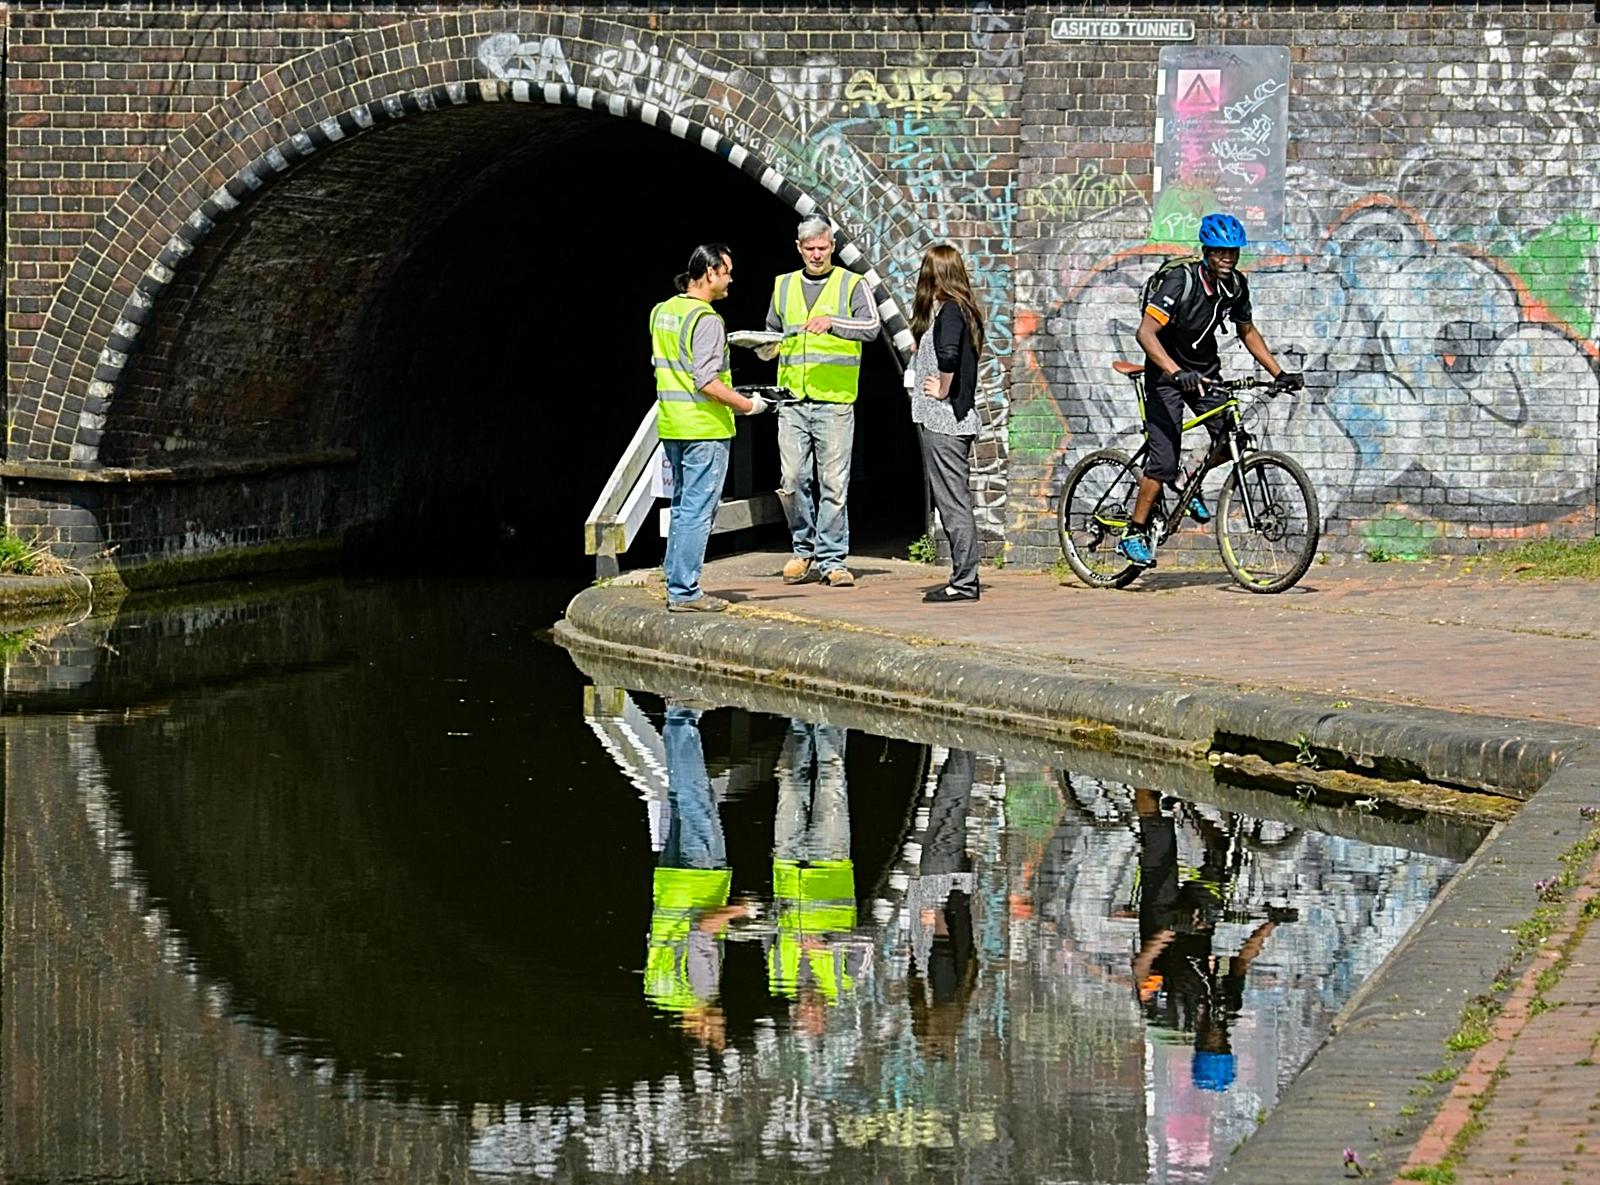 Ashted Tunnel Birmingham MRS_2936